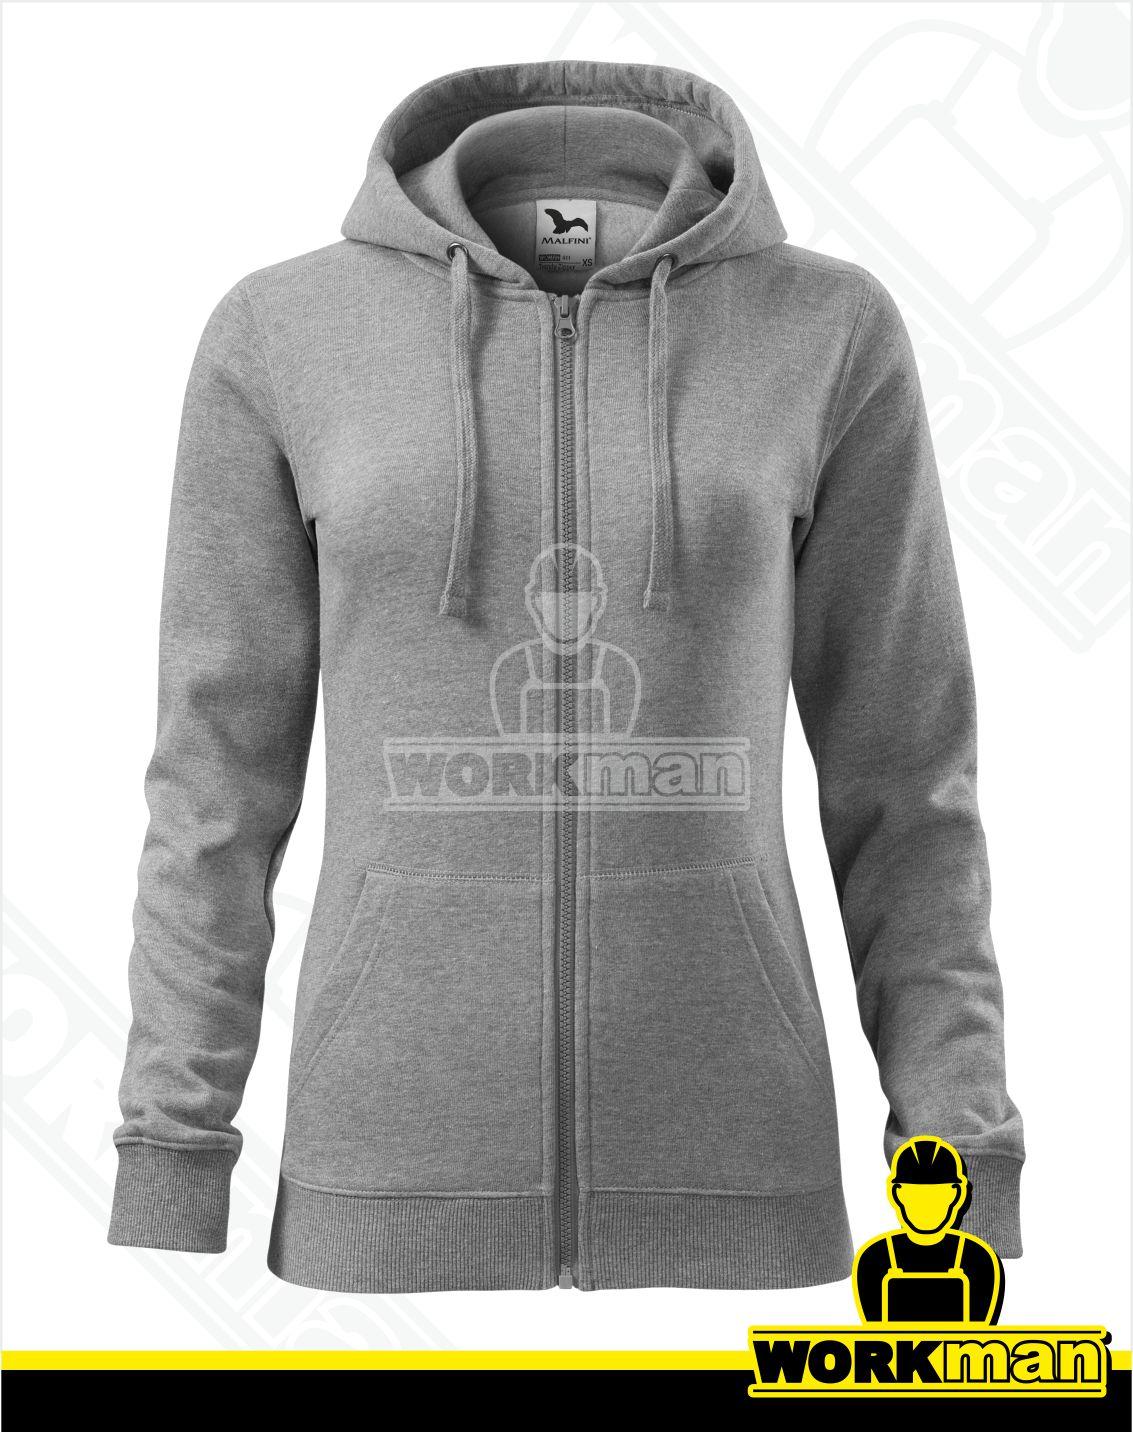 76ce7f154200 Dámska mikina TRENDY ZIPPER Malfini Pracovné odevy Workman